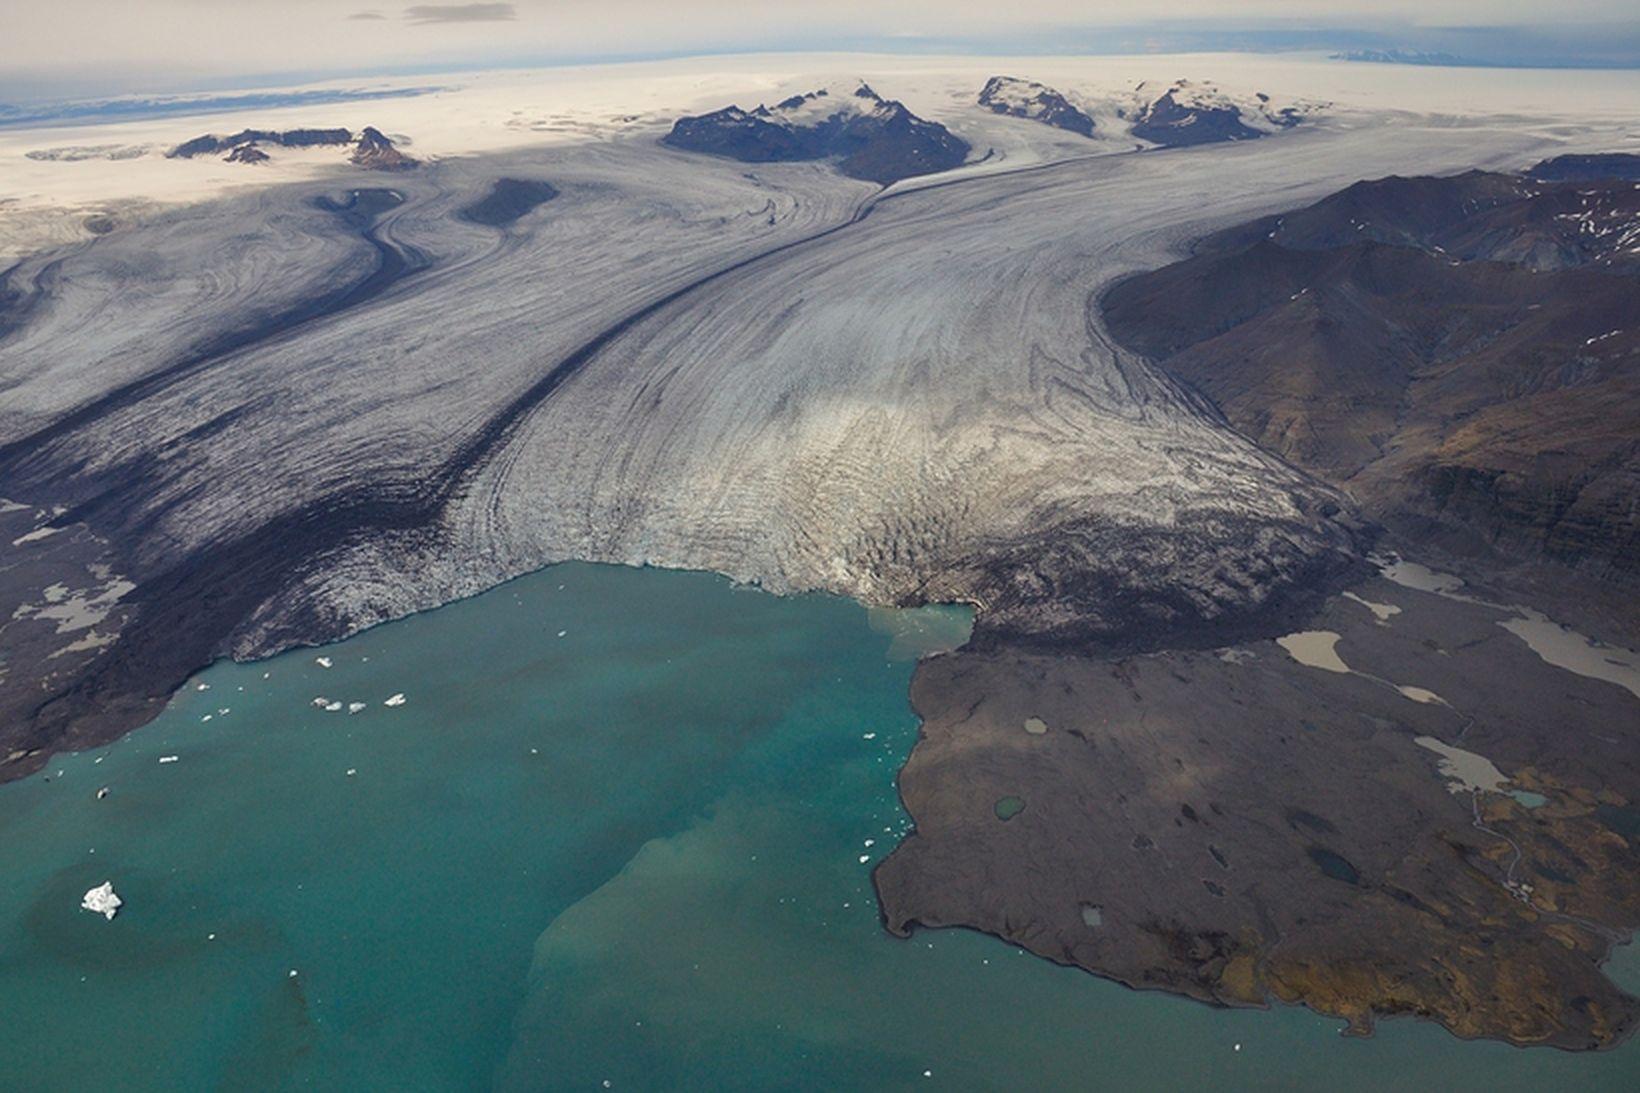 Breiðamerkurjökull og Jökulsárlón, 10. október 2014. Esjufjallarönd, svarta röndin sem …